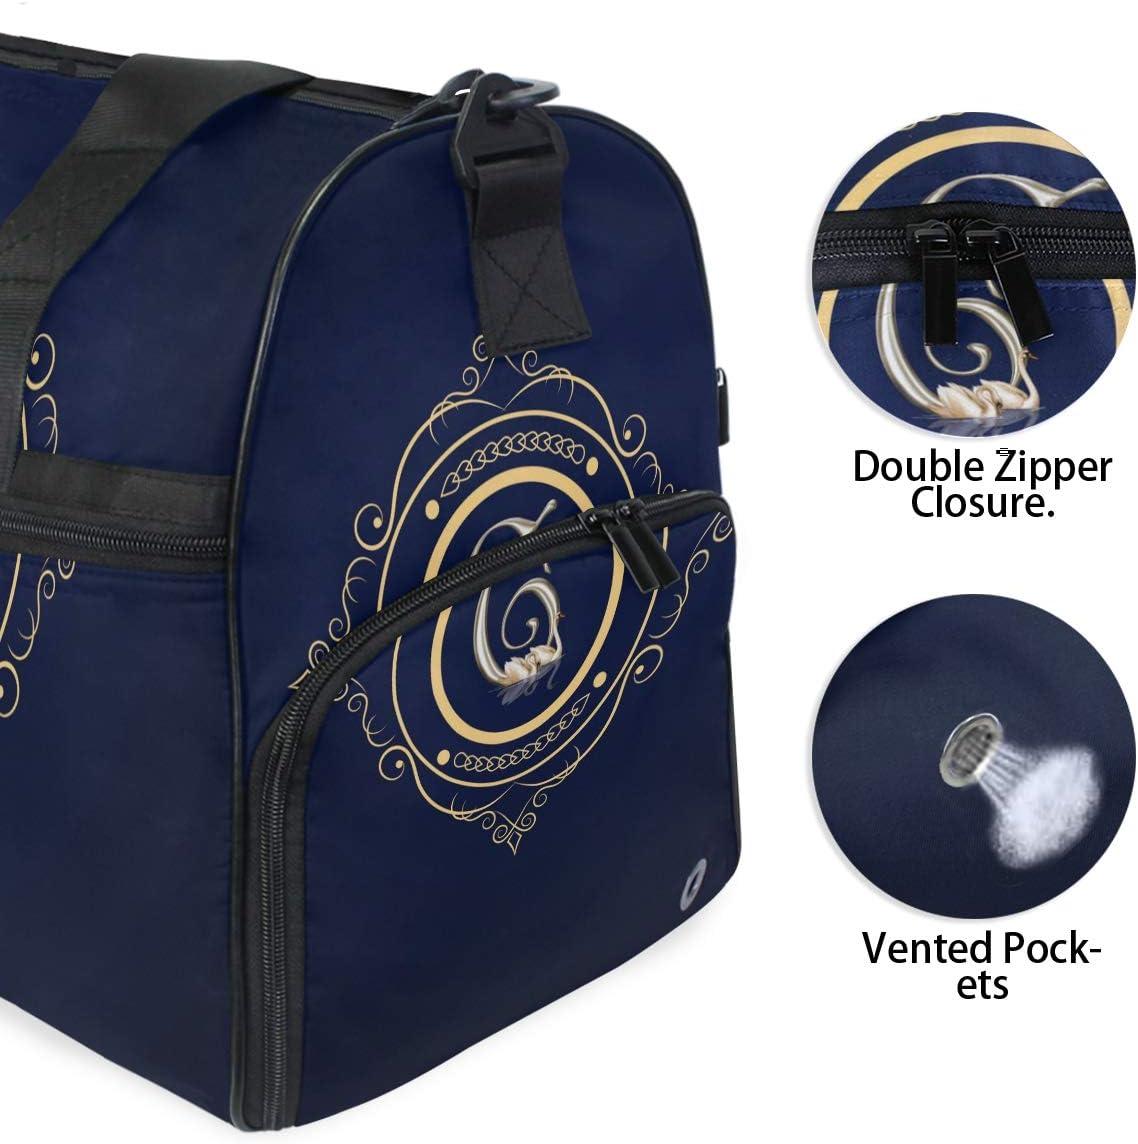 FANTAZIO Monogram Sports Bag Packable Travel Duffle Bag Lightweight Water Resistant Tear Resistant